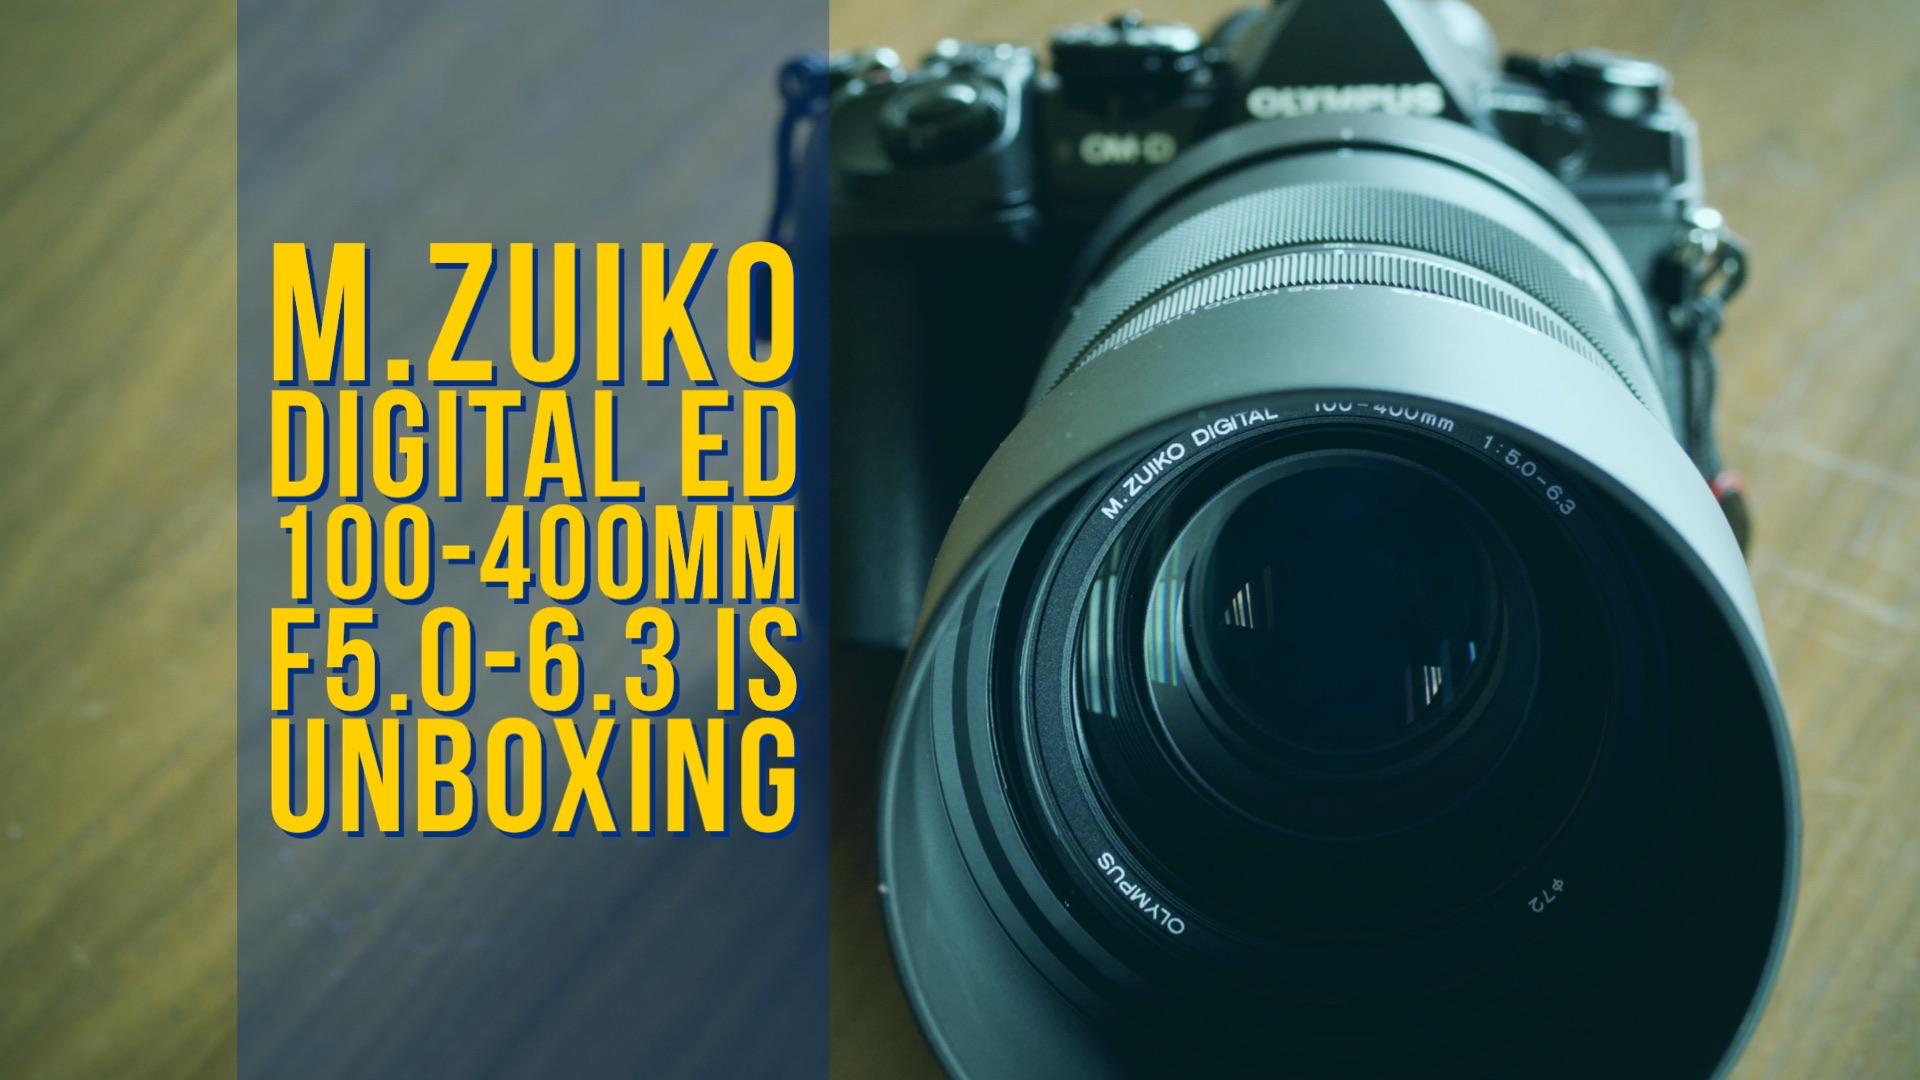 M.ZUIKO DIGITAL ED 100-400mm F5.0-6.3 IS UNBOXING